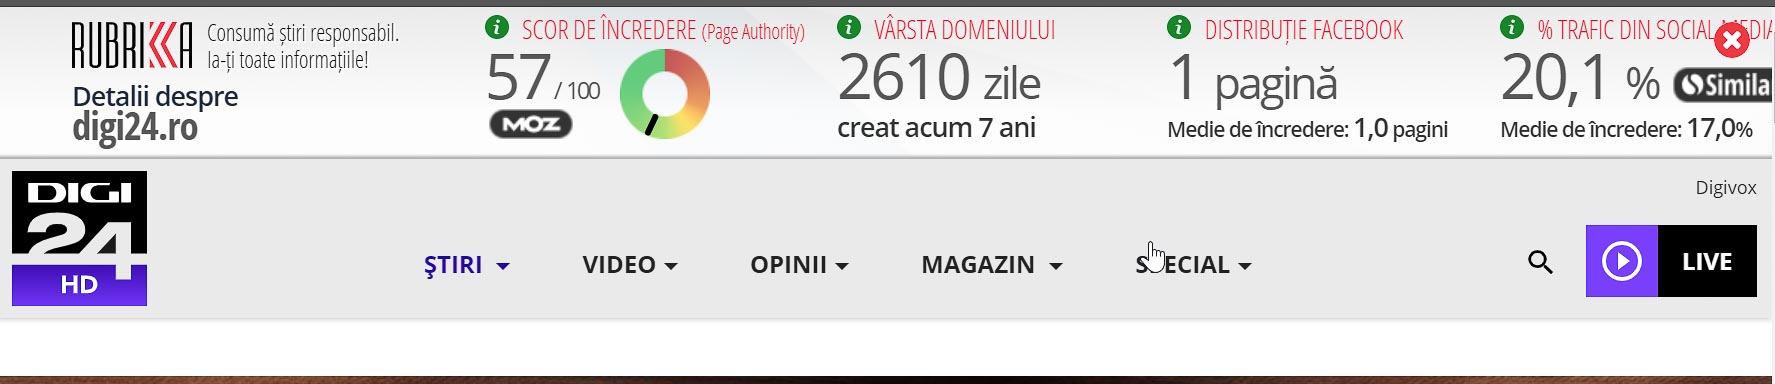 Rubrika.ro extenise Chrome